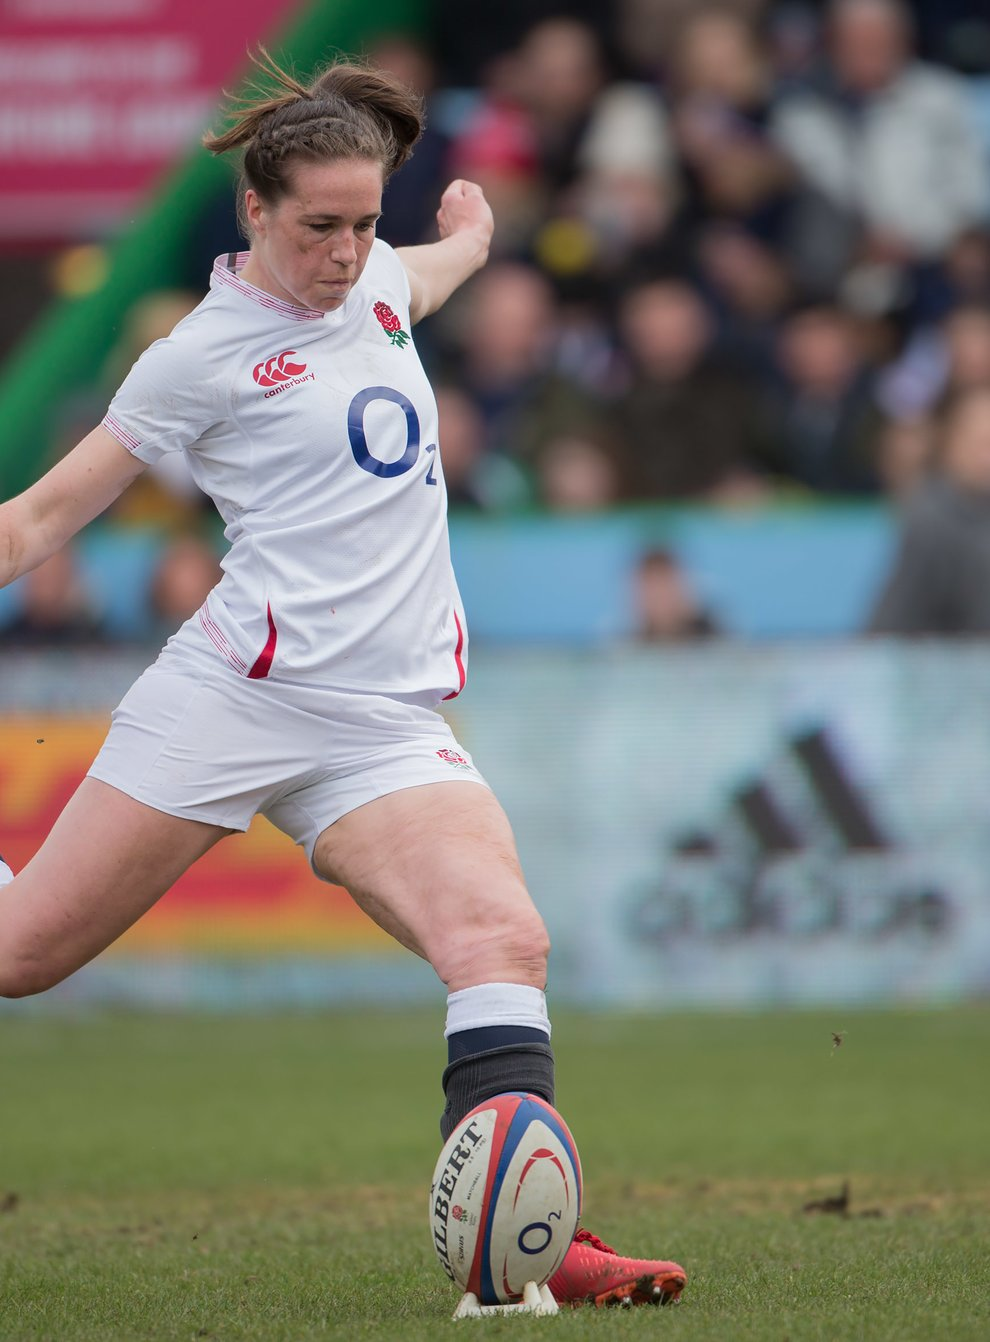 <p>England's Scarrratt draws praise from Brian Moore</p>